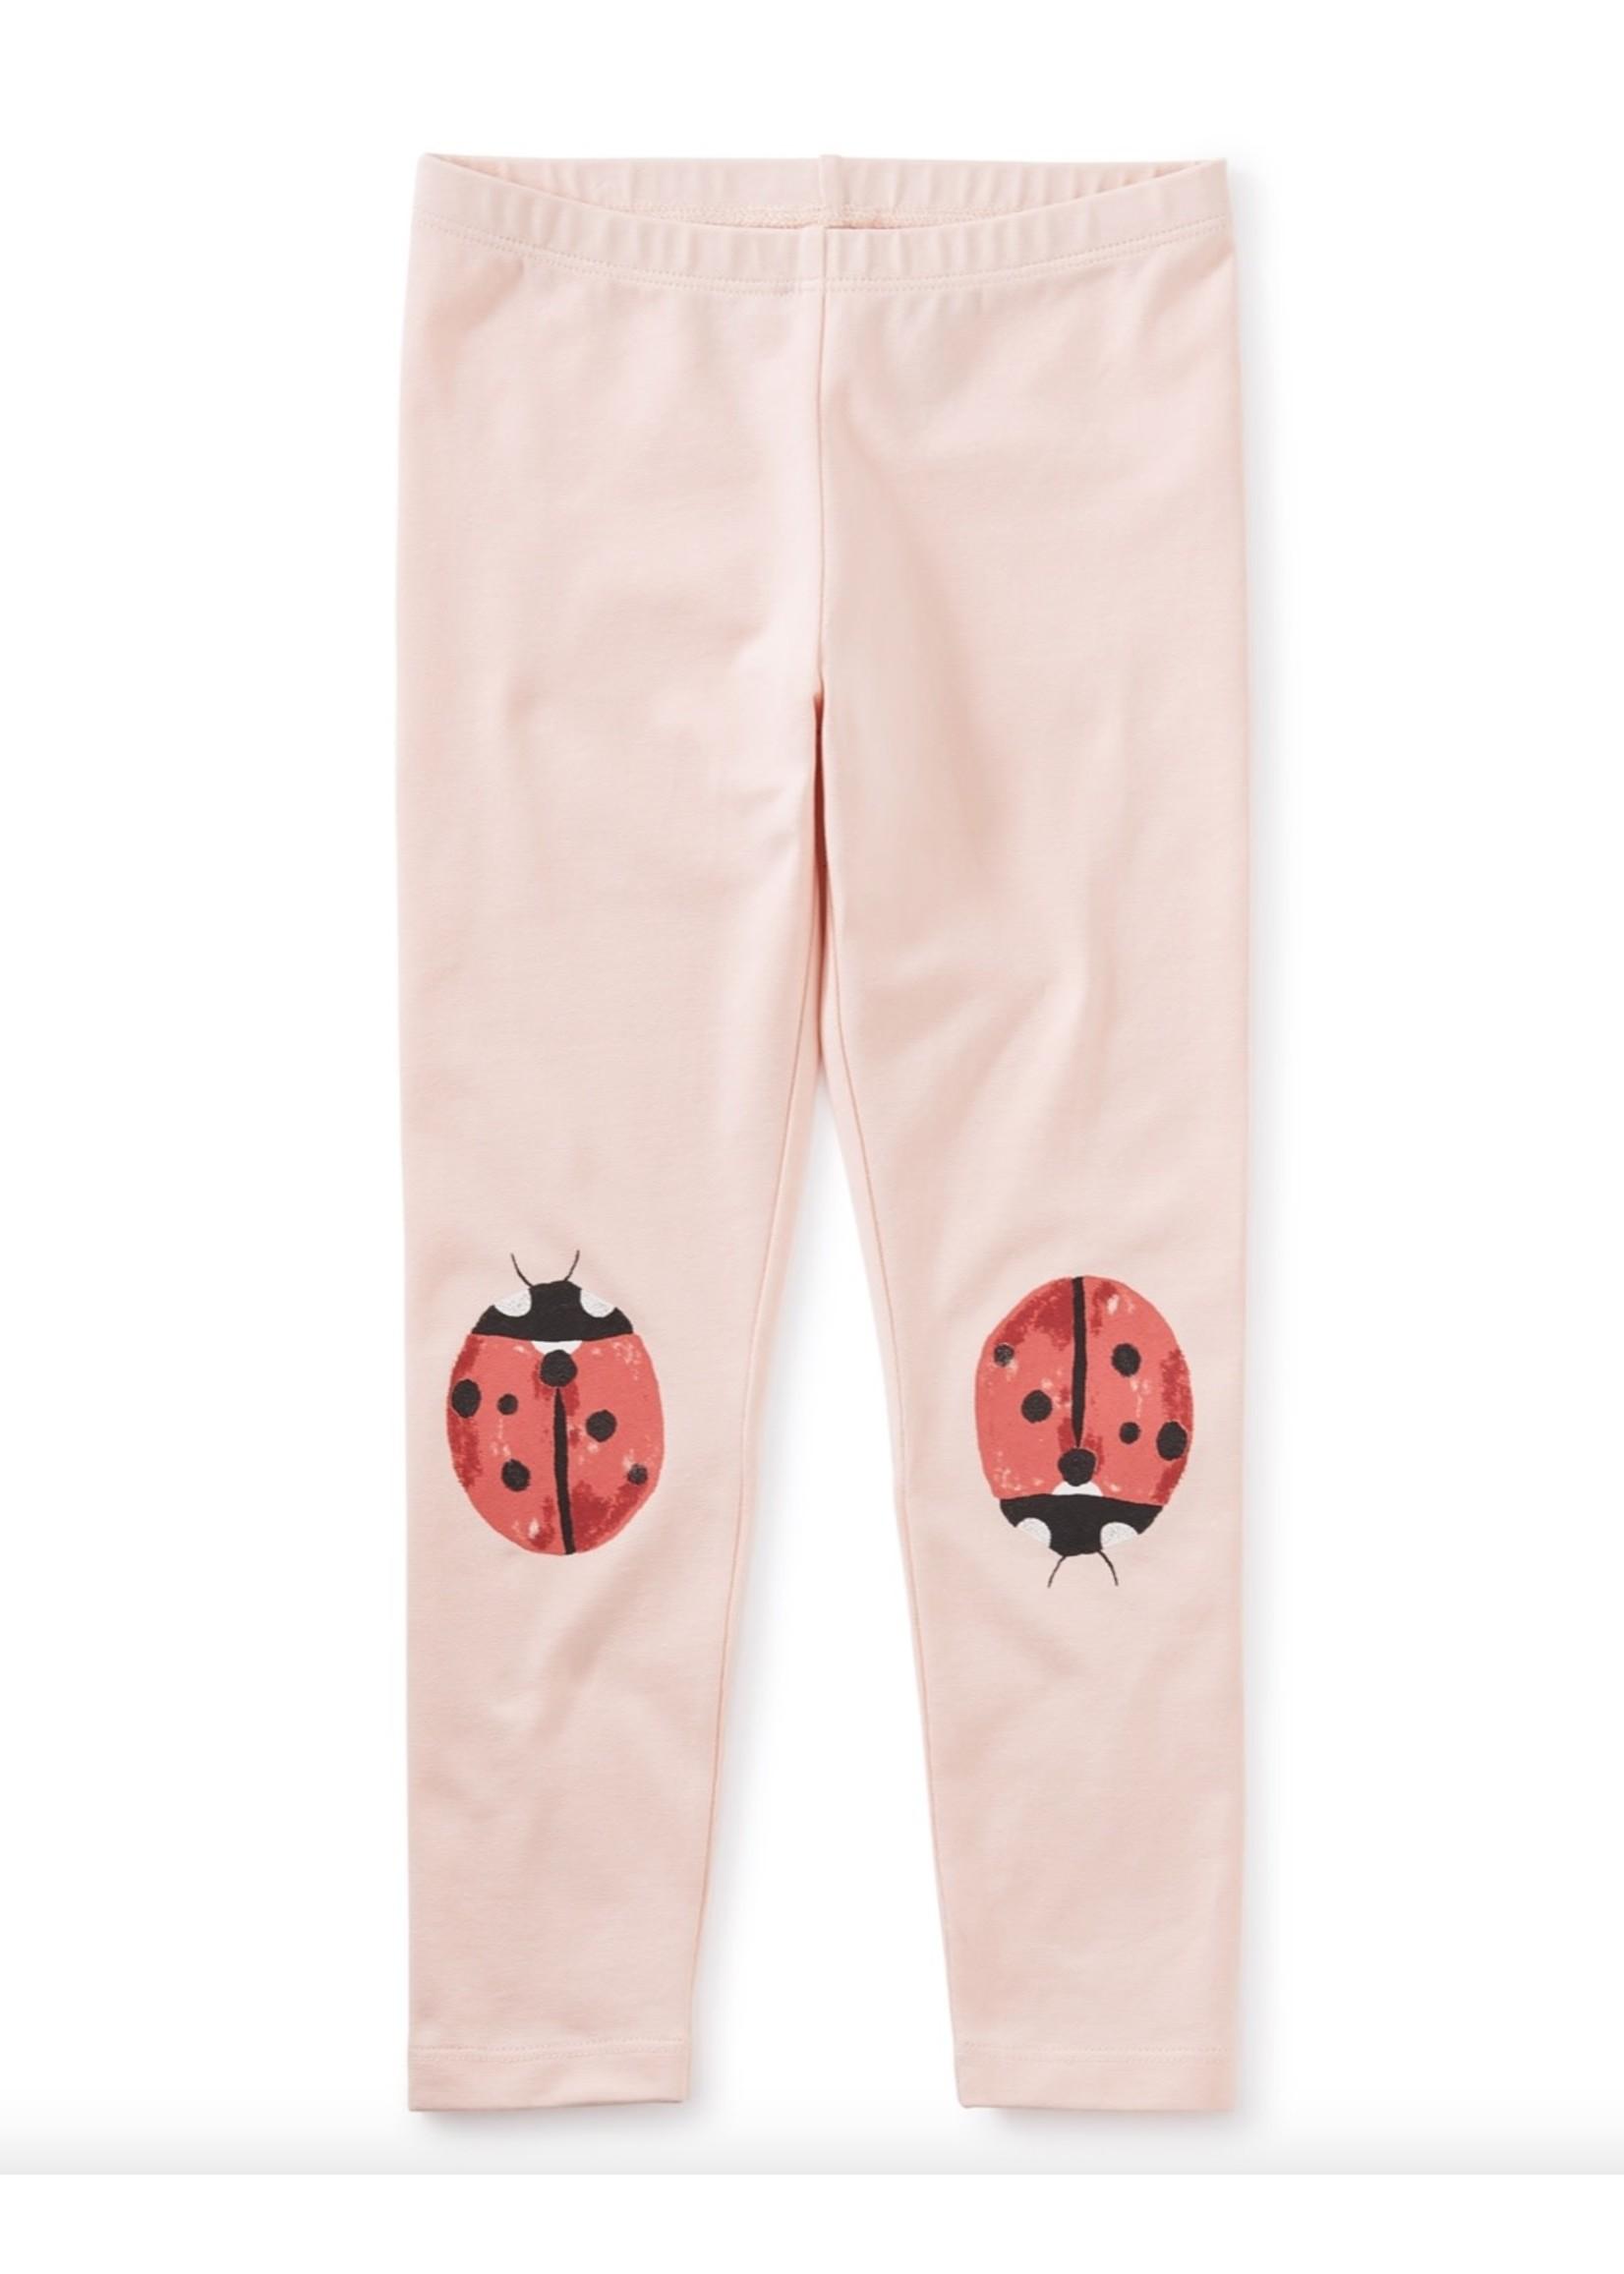 Tea Collection Li'l Ladybugs Leggings in Pink Salt